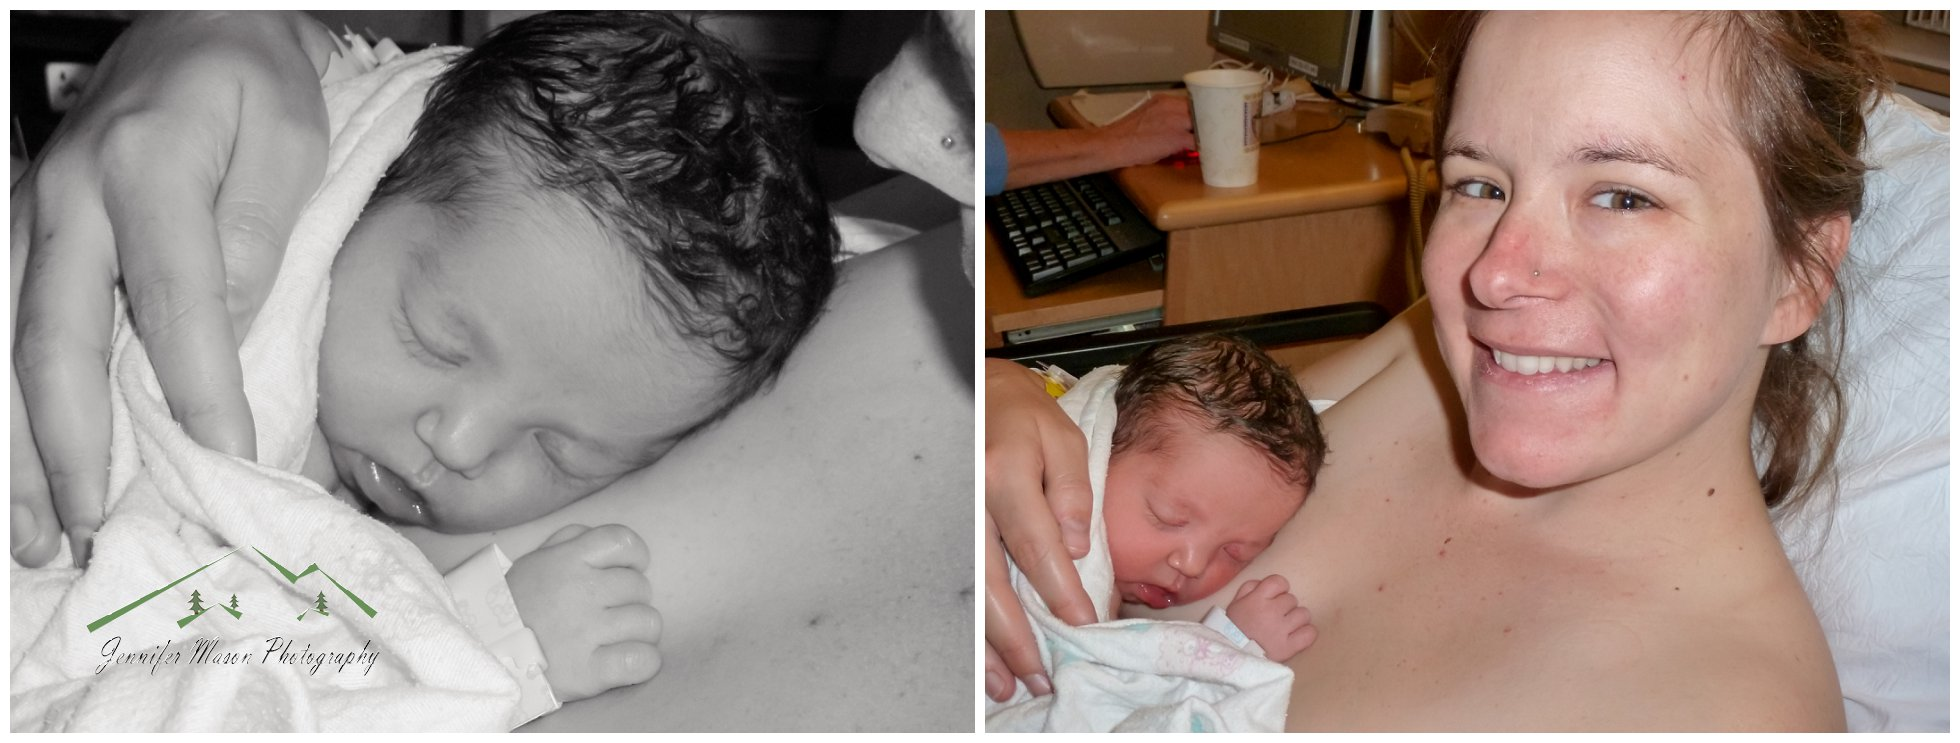 Denver birth photographer, Jennifer Mason Photography